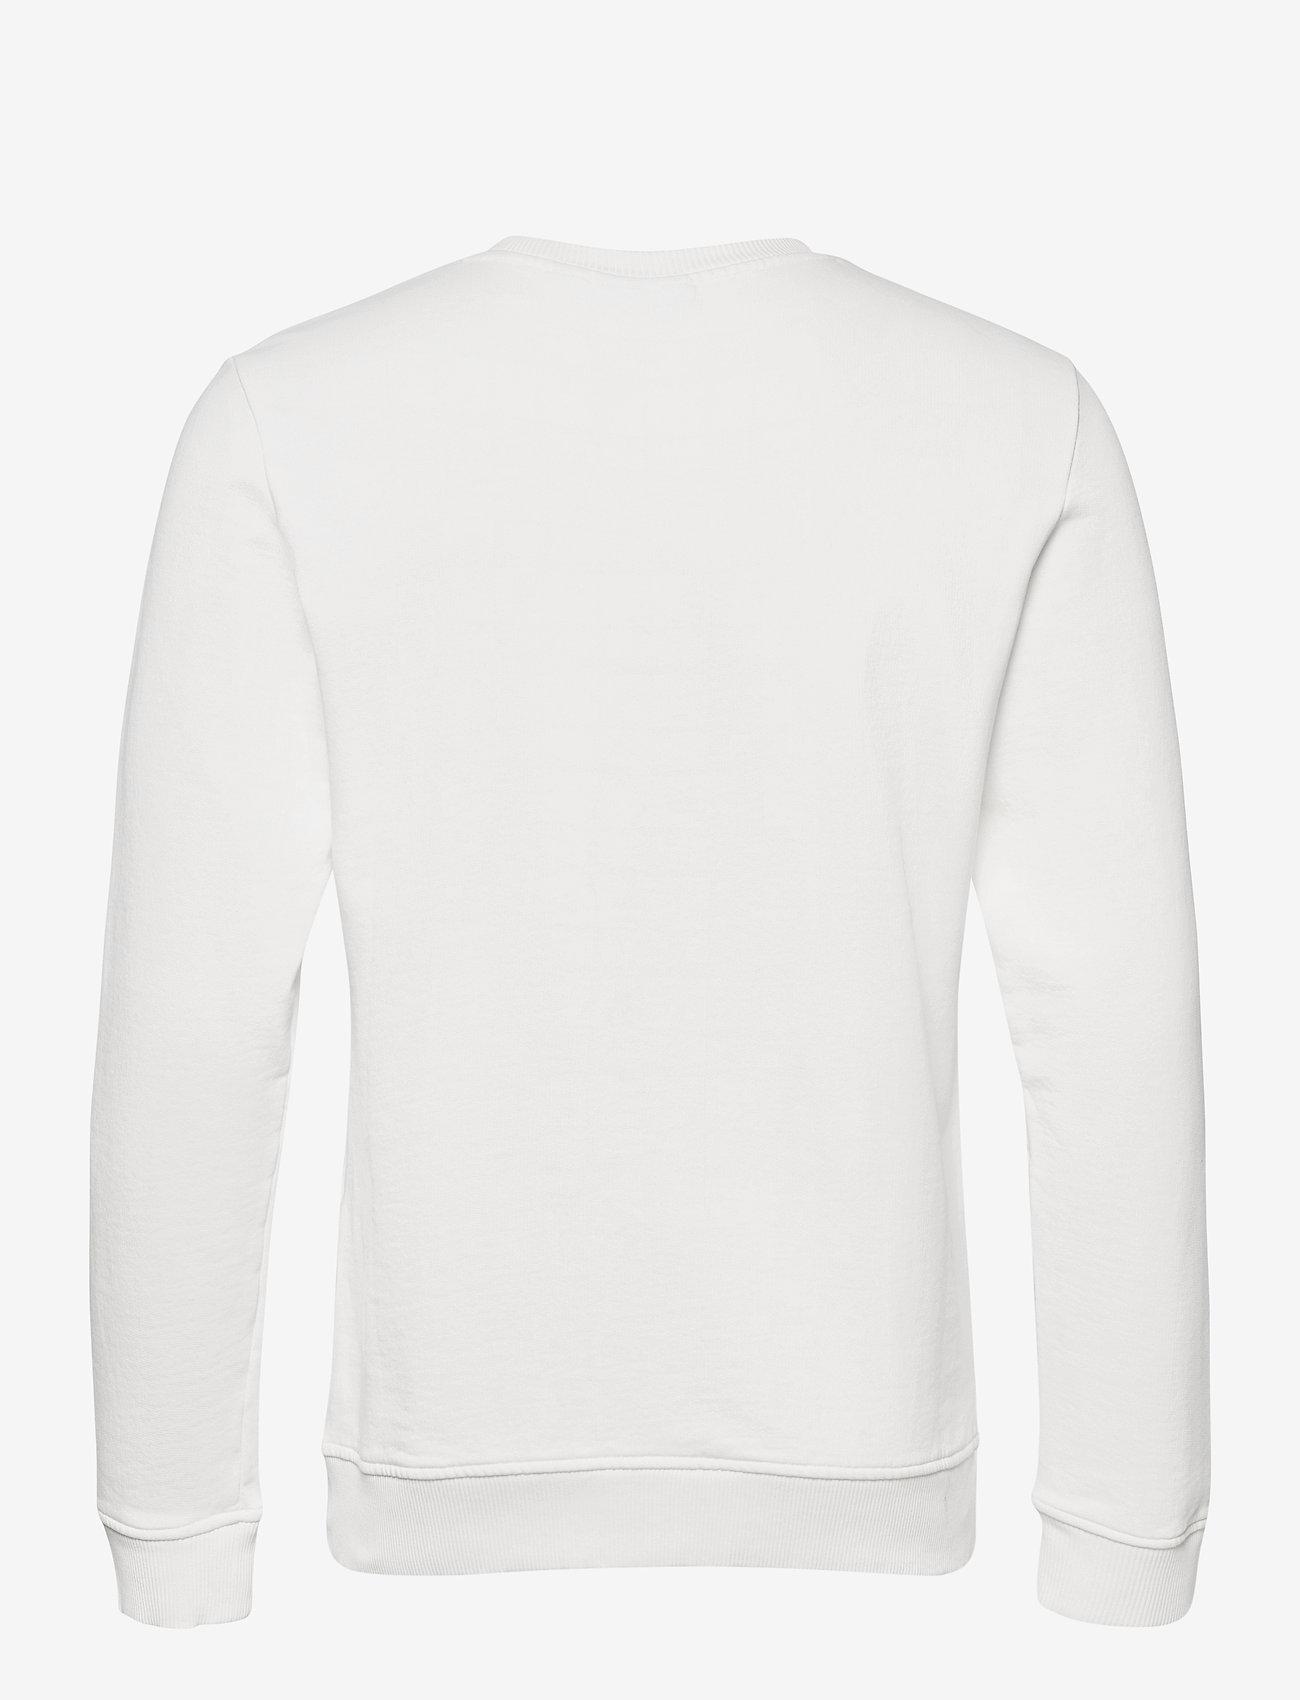 Napapijri - BALIS CREW - podstawowe bluzy - bright white - 2